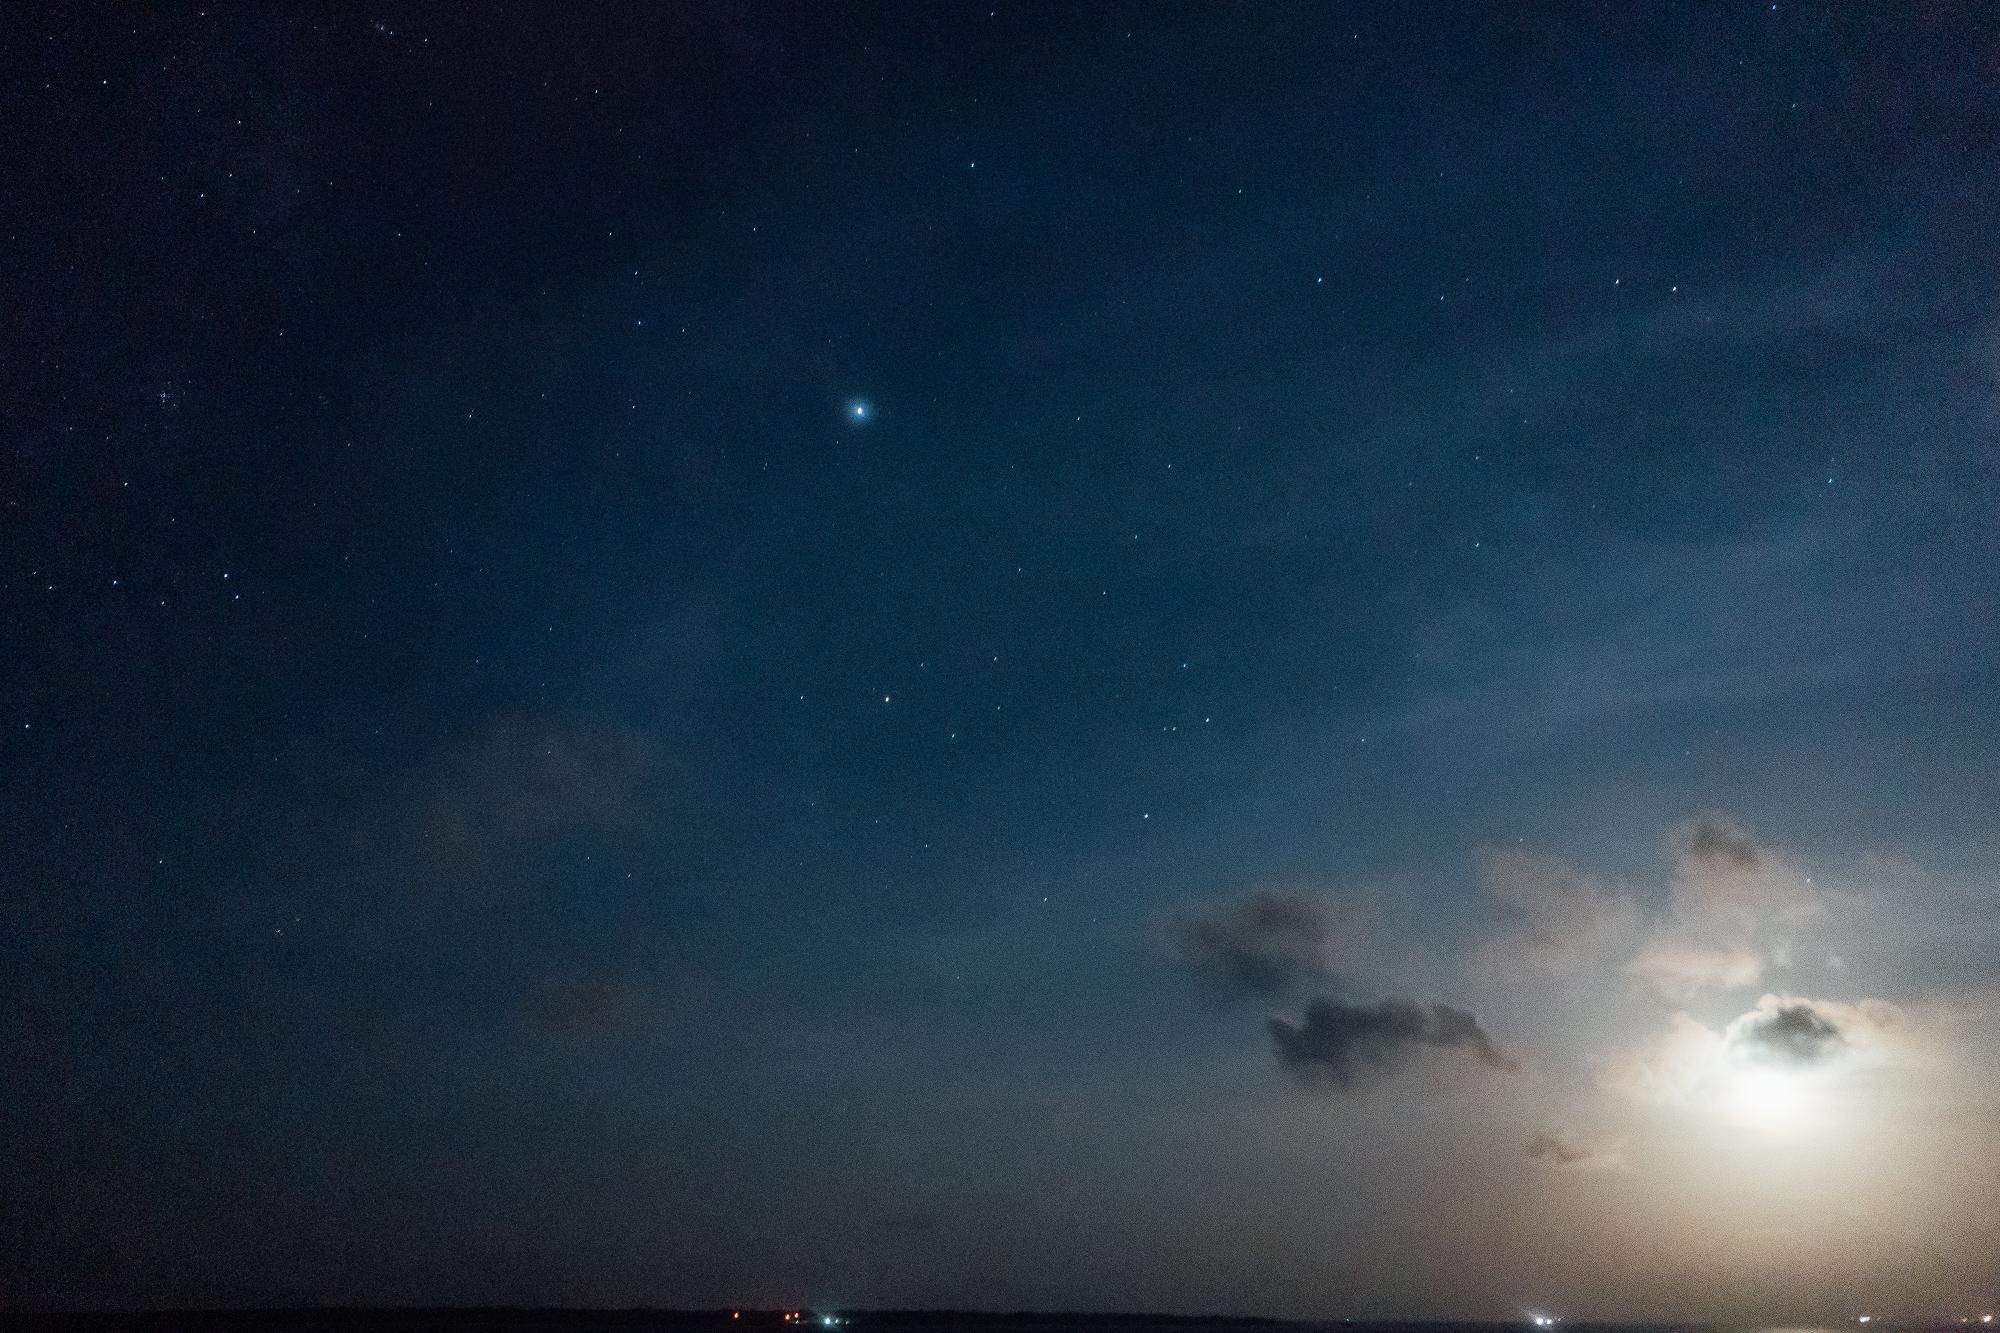 石垣島の月・星空